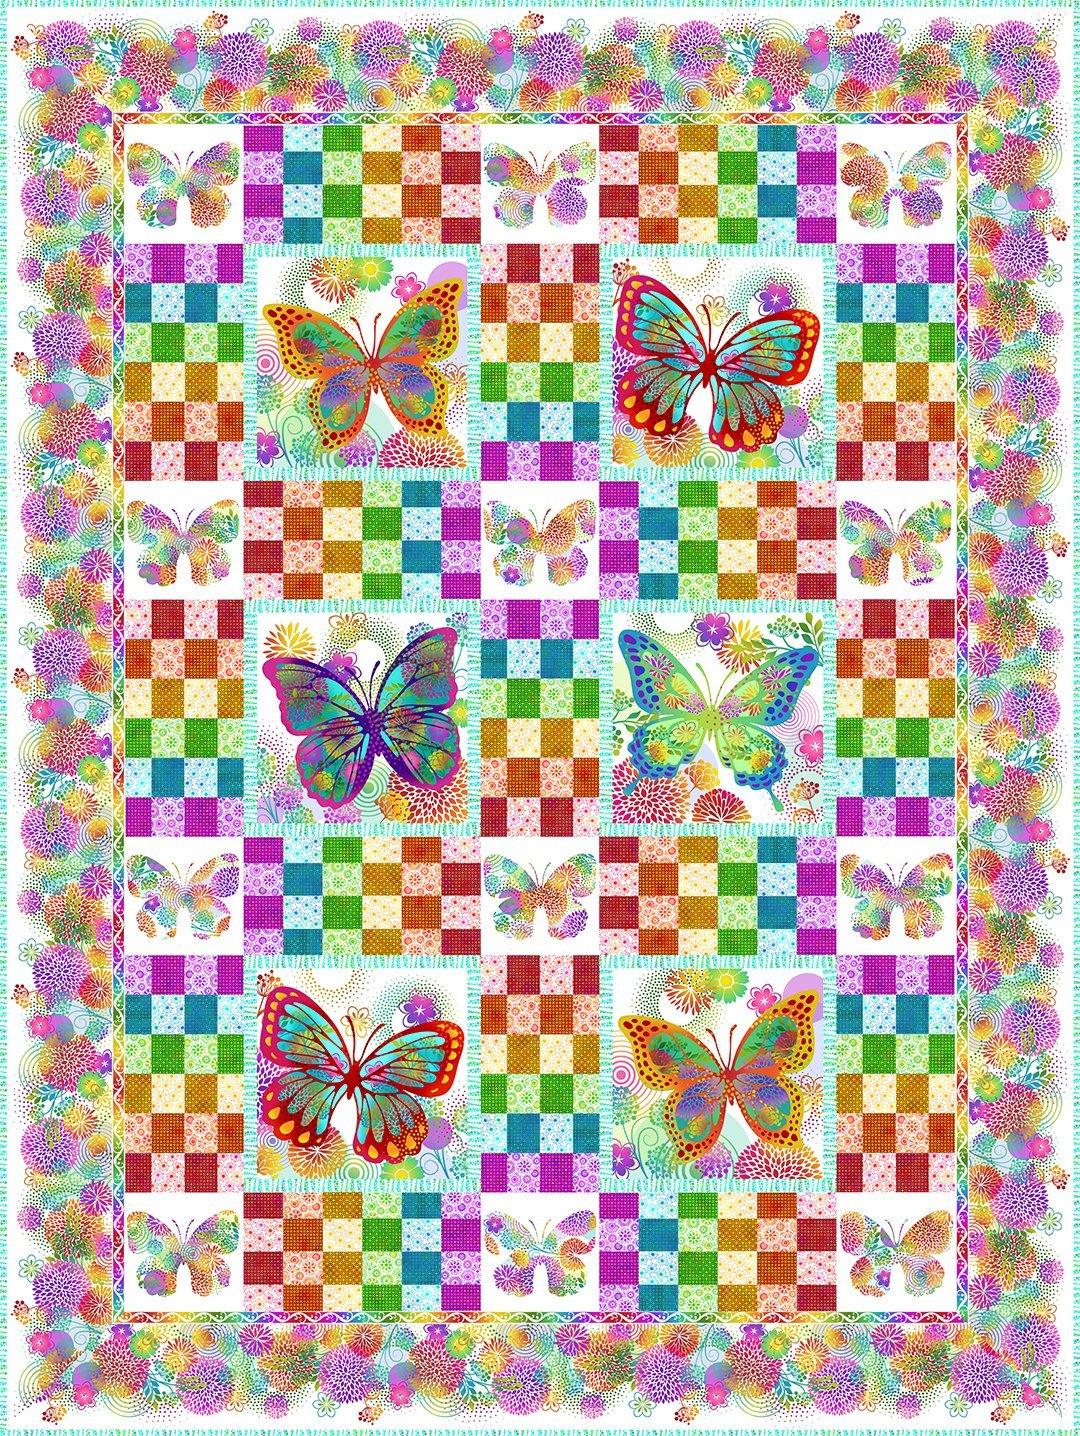 Unusual Garden II Butterfly Quilt Kit - White